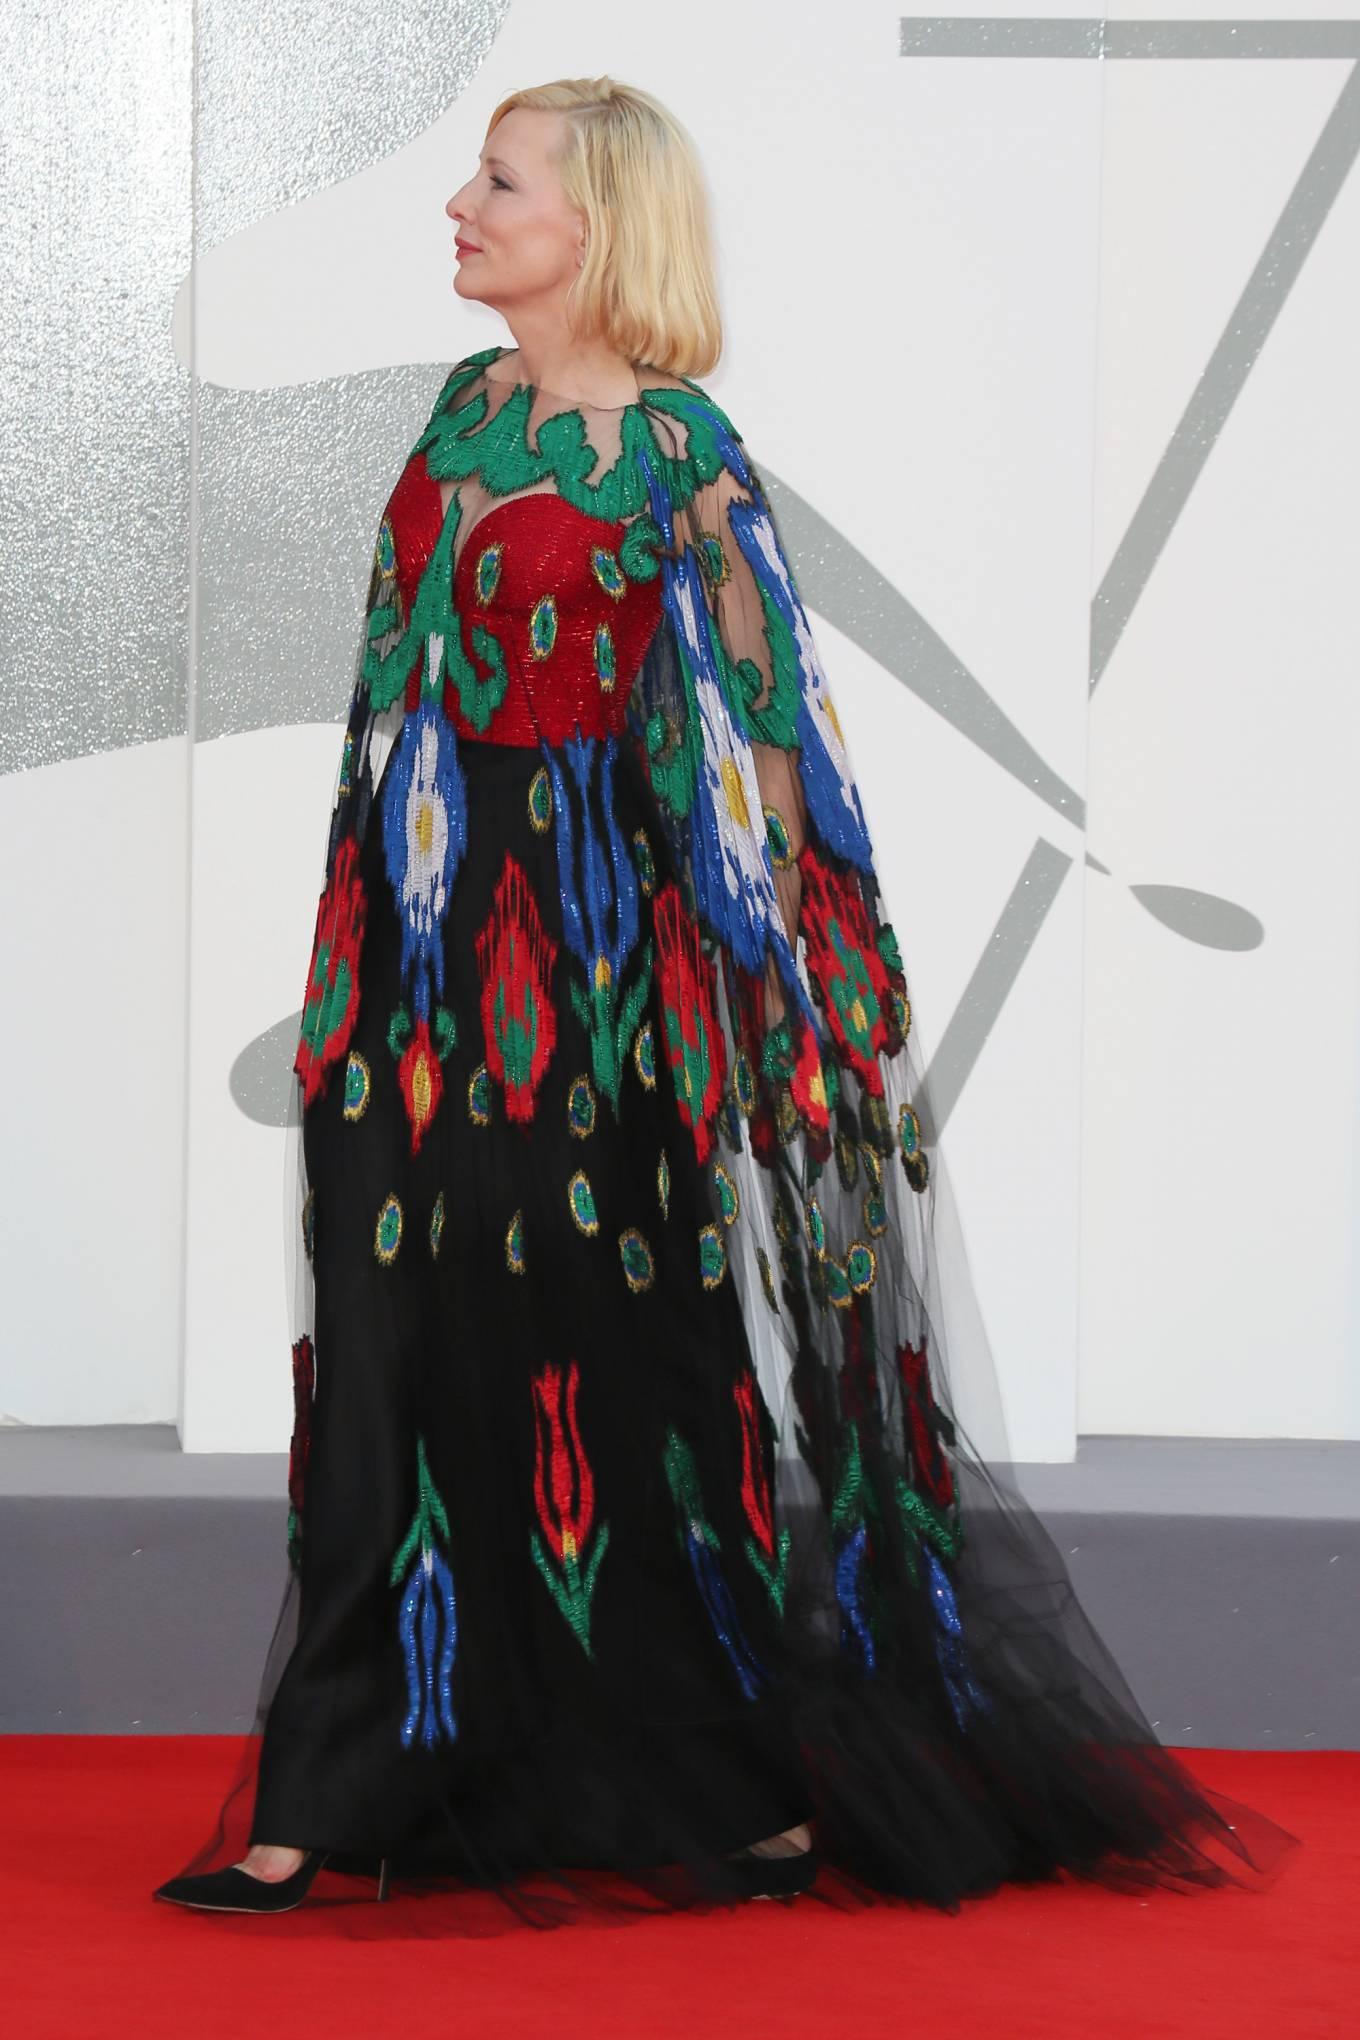 Cate Blanchett 2020 : Cate Blanchett – Closing Ceremony Red Carpet of 2020 Venice Film Festival in Venice-05